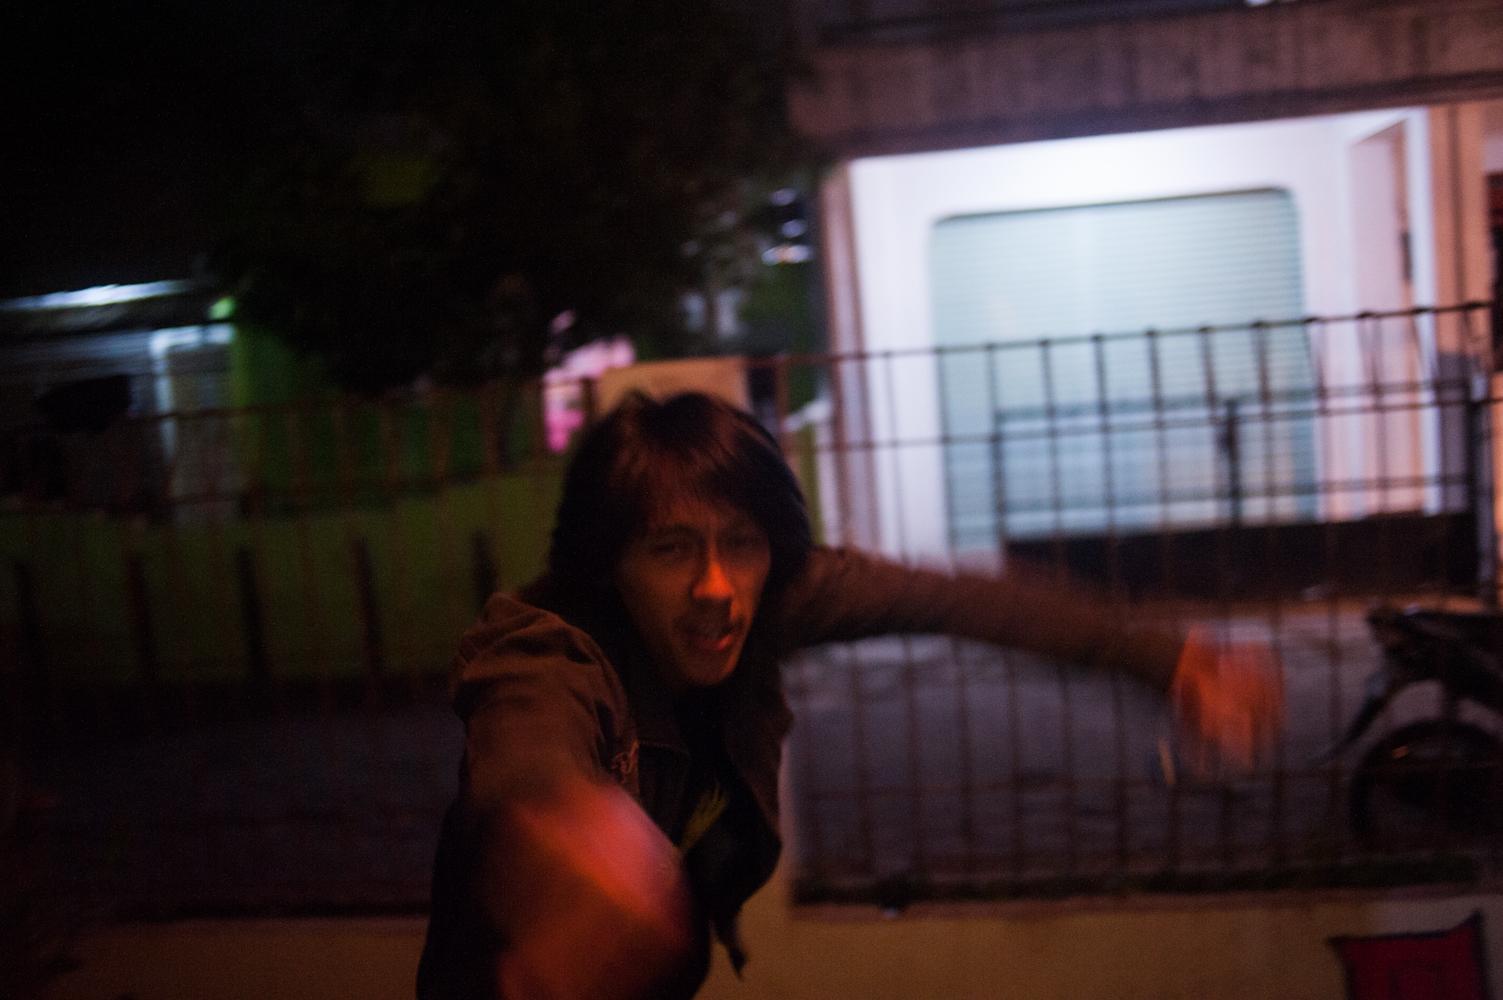 20120720_KEVINMICHAELBRIGGS_indonesia_001-4.jpg